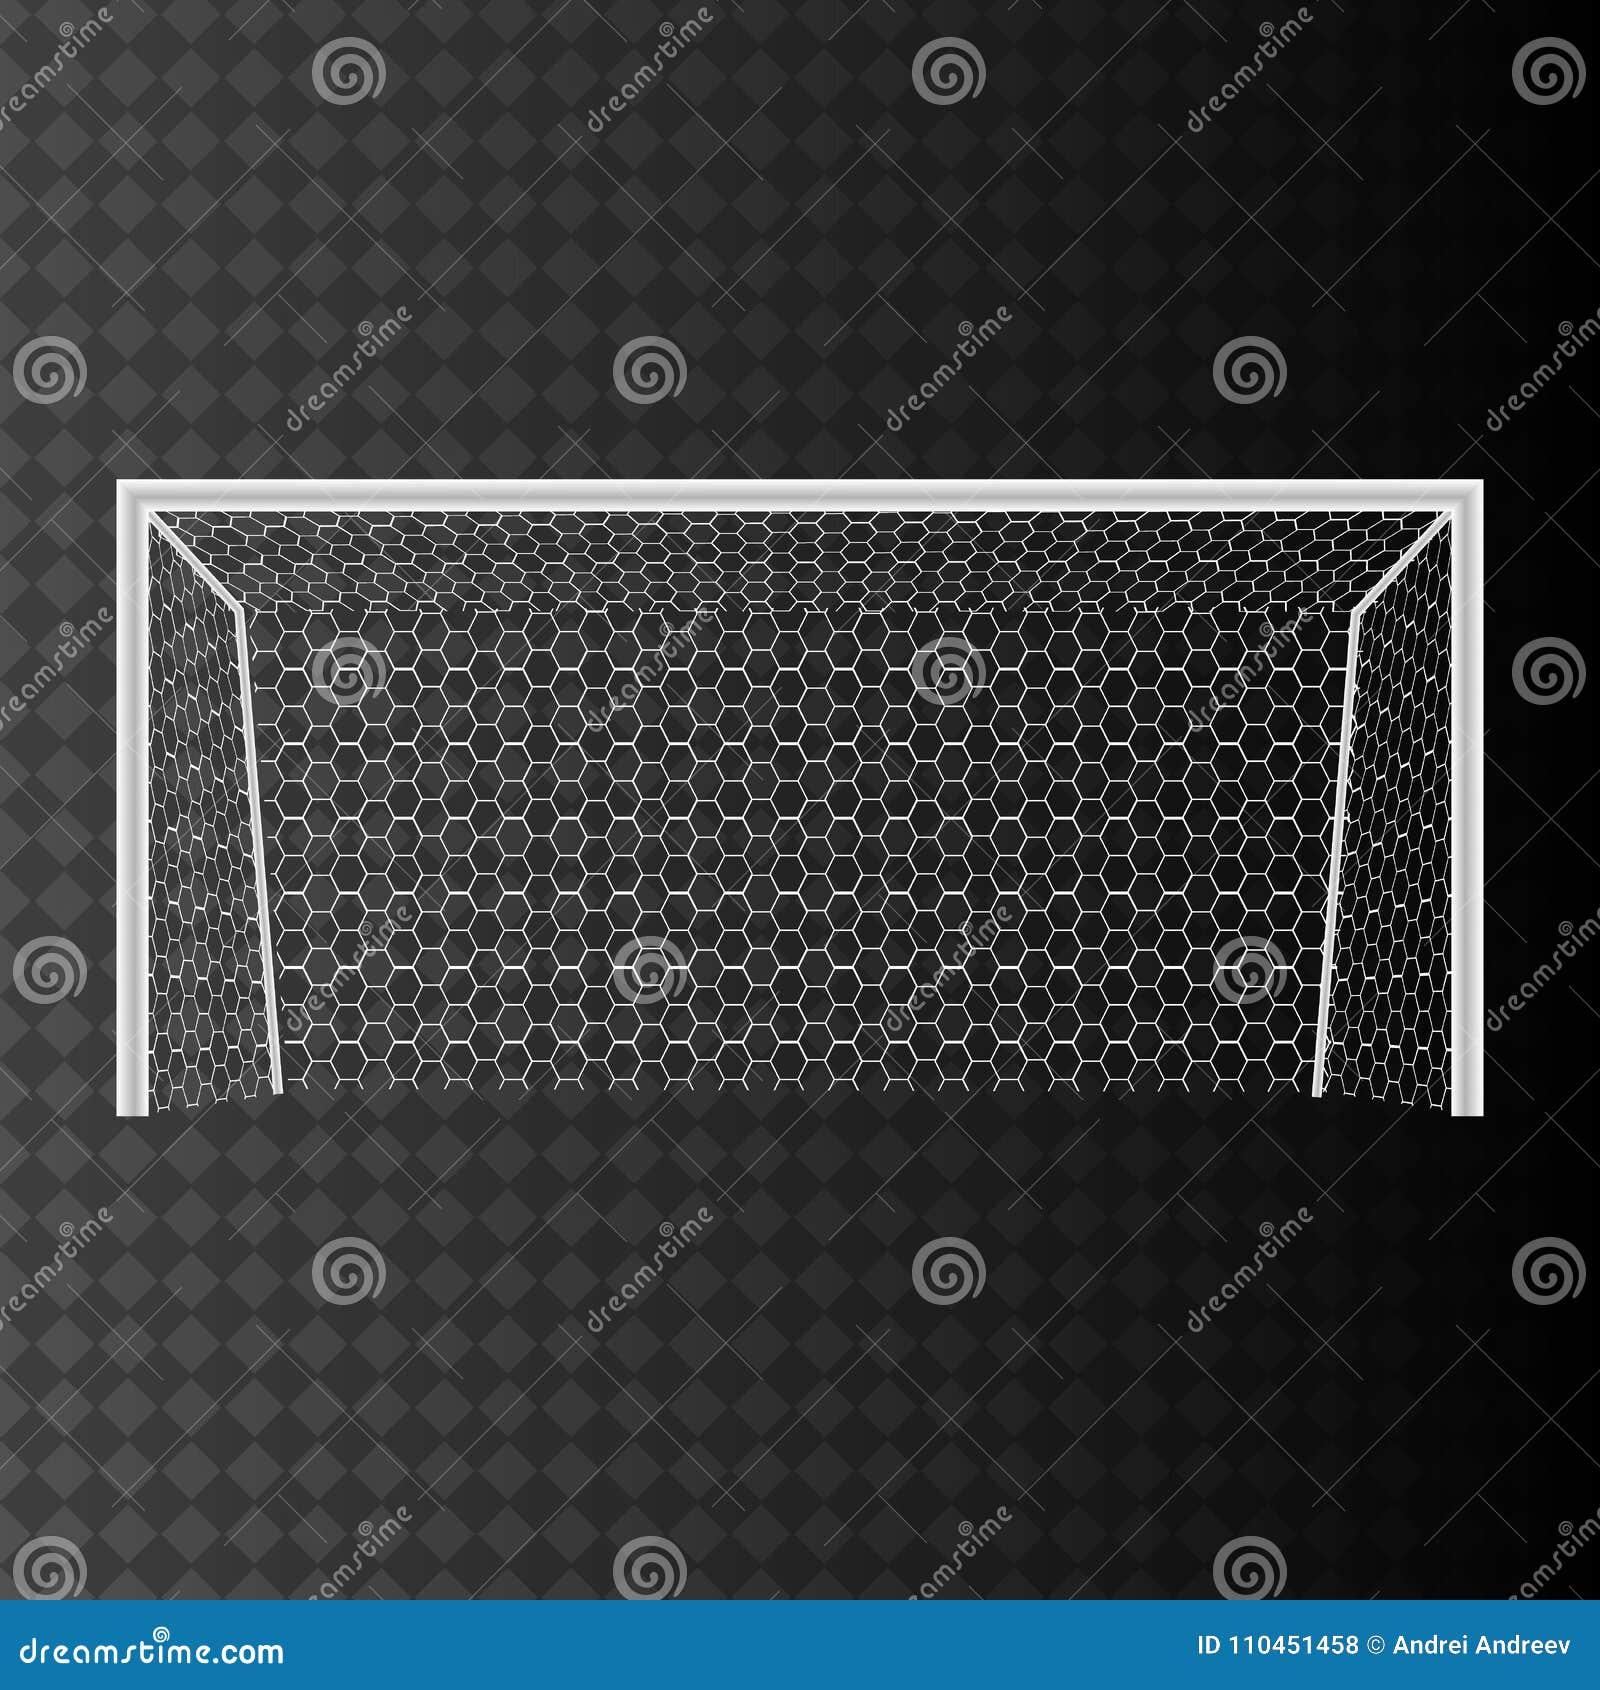 Fotbollmål med netto på en genomskinlig bakgrund